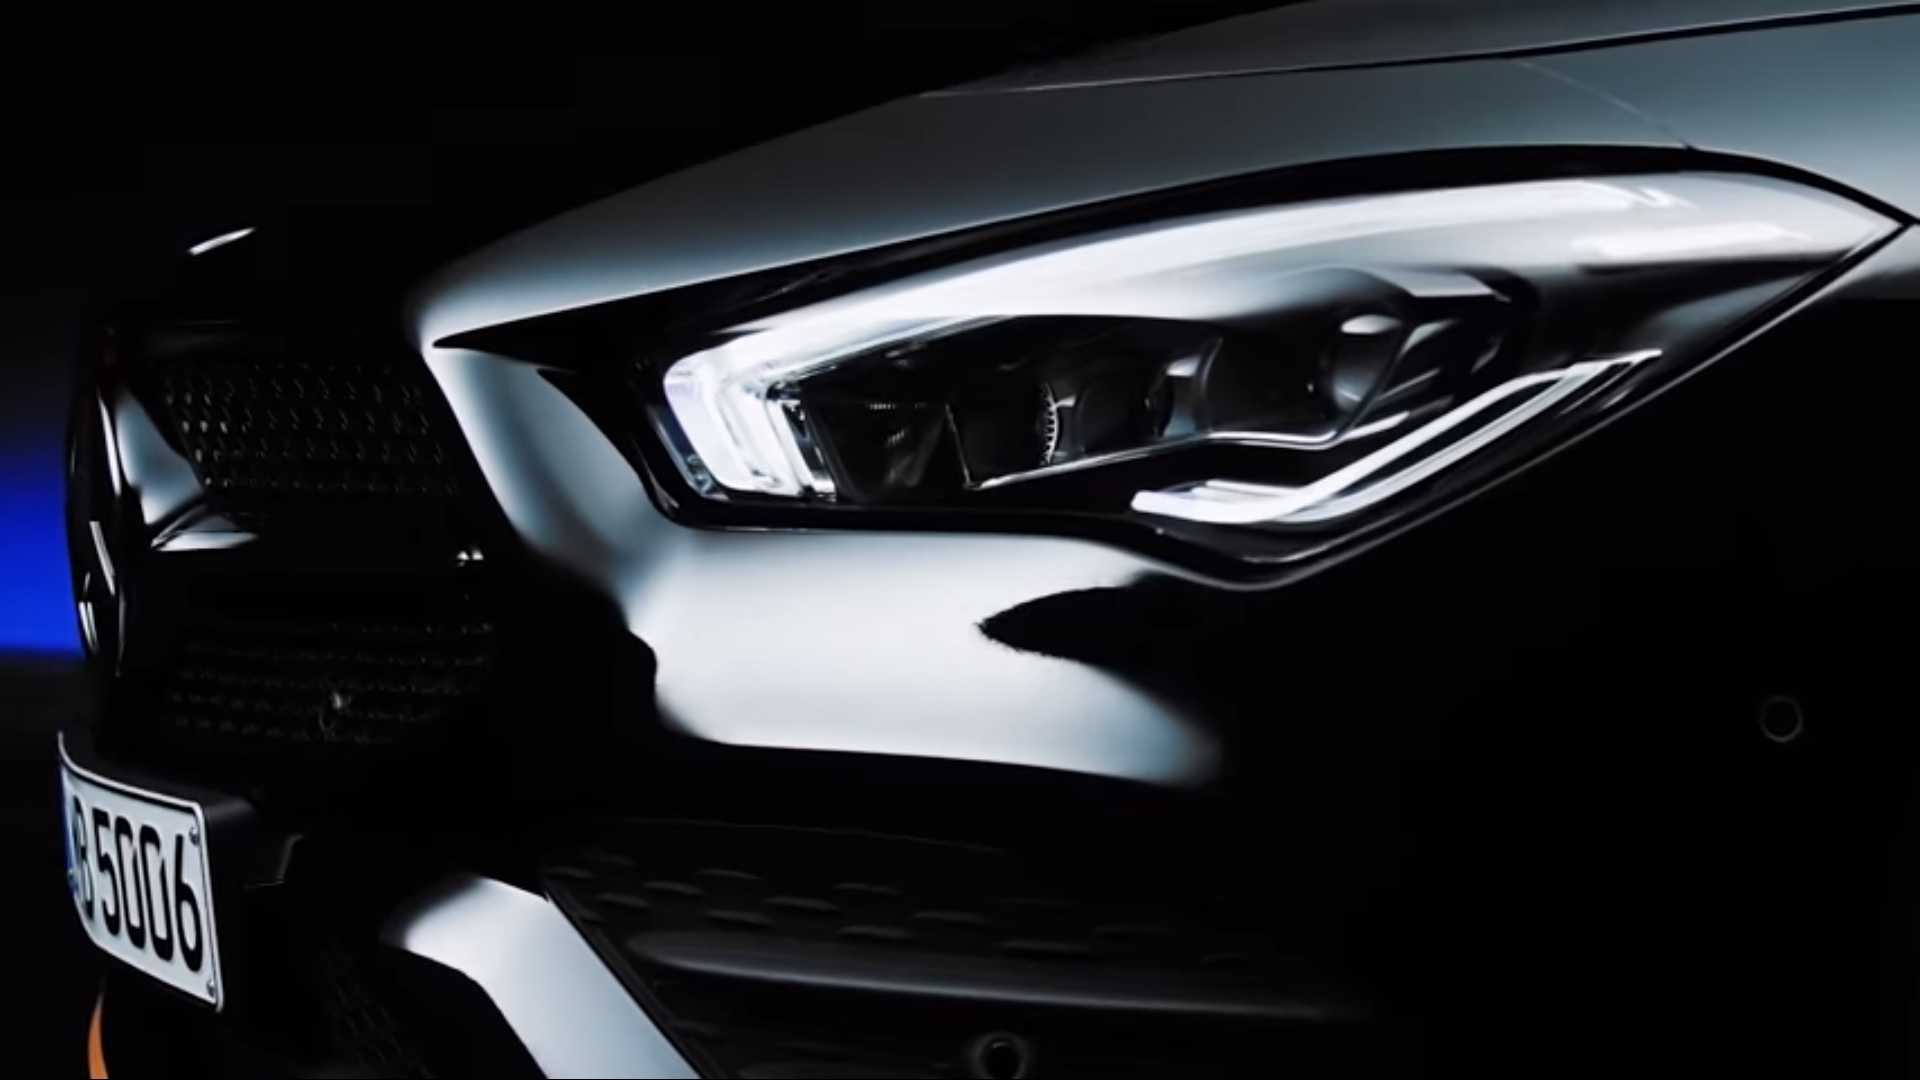 2020 Mercedes Benz CLA tanıtım videosu